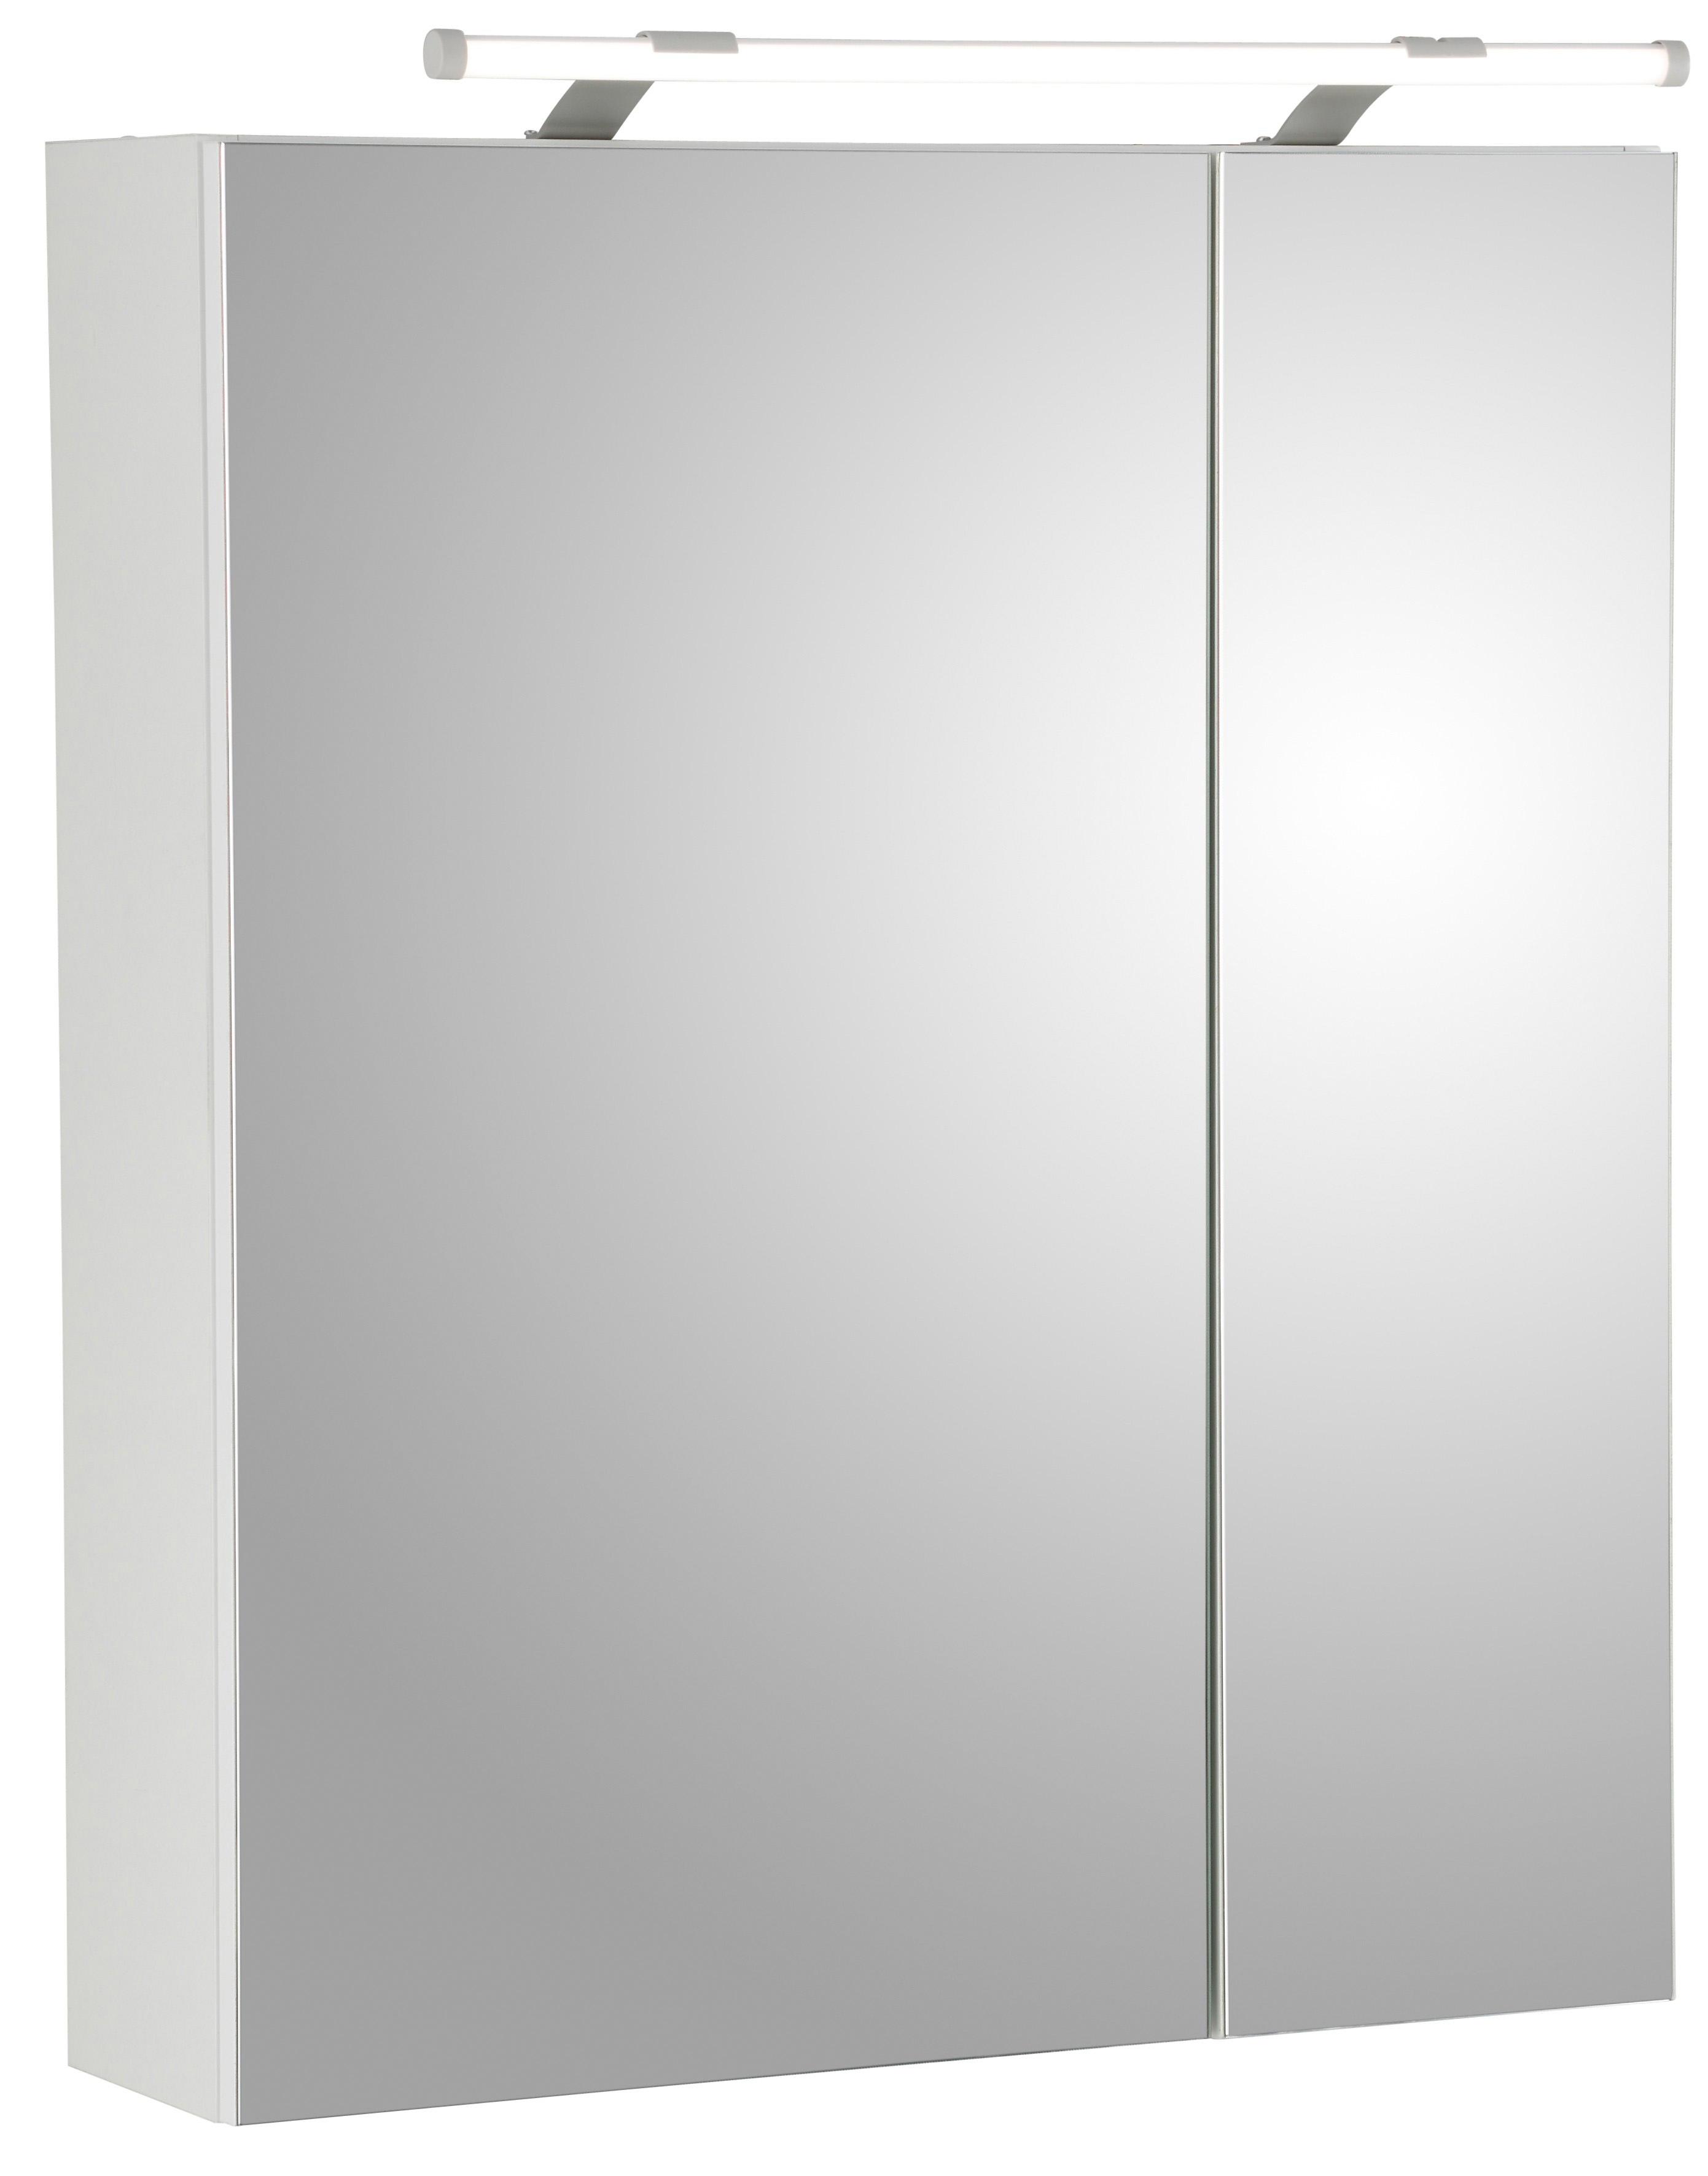 Schildmeyer spiegelkast Dorina Breedte 60 cm, 2-deurs, ledverlichting, schakelaar-/stekkerdoos, glasplateaus, Made in Germany - verschillende betaalmethodes